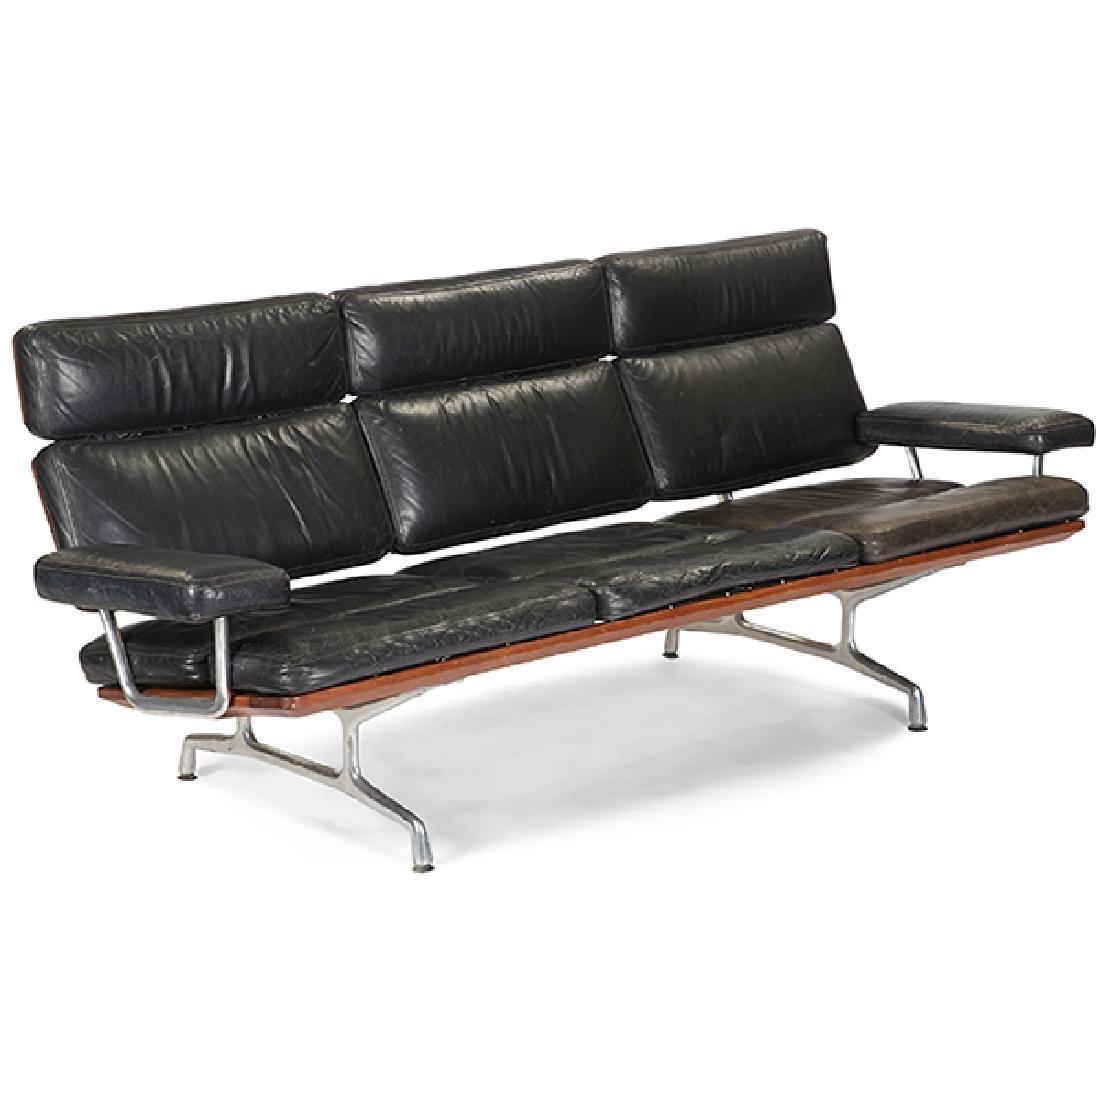 Charles & Ray Eames Sofa Model 3473 for Herman Miller